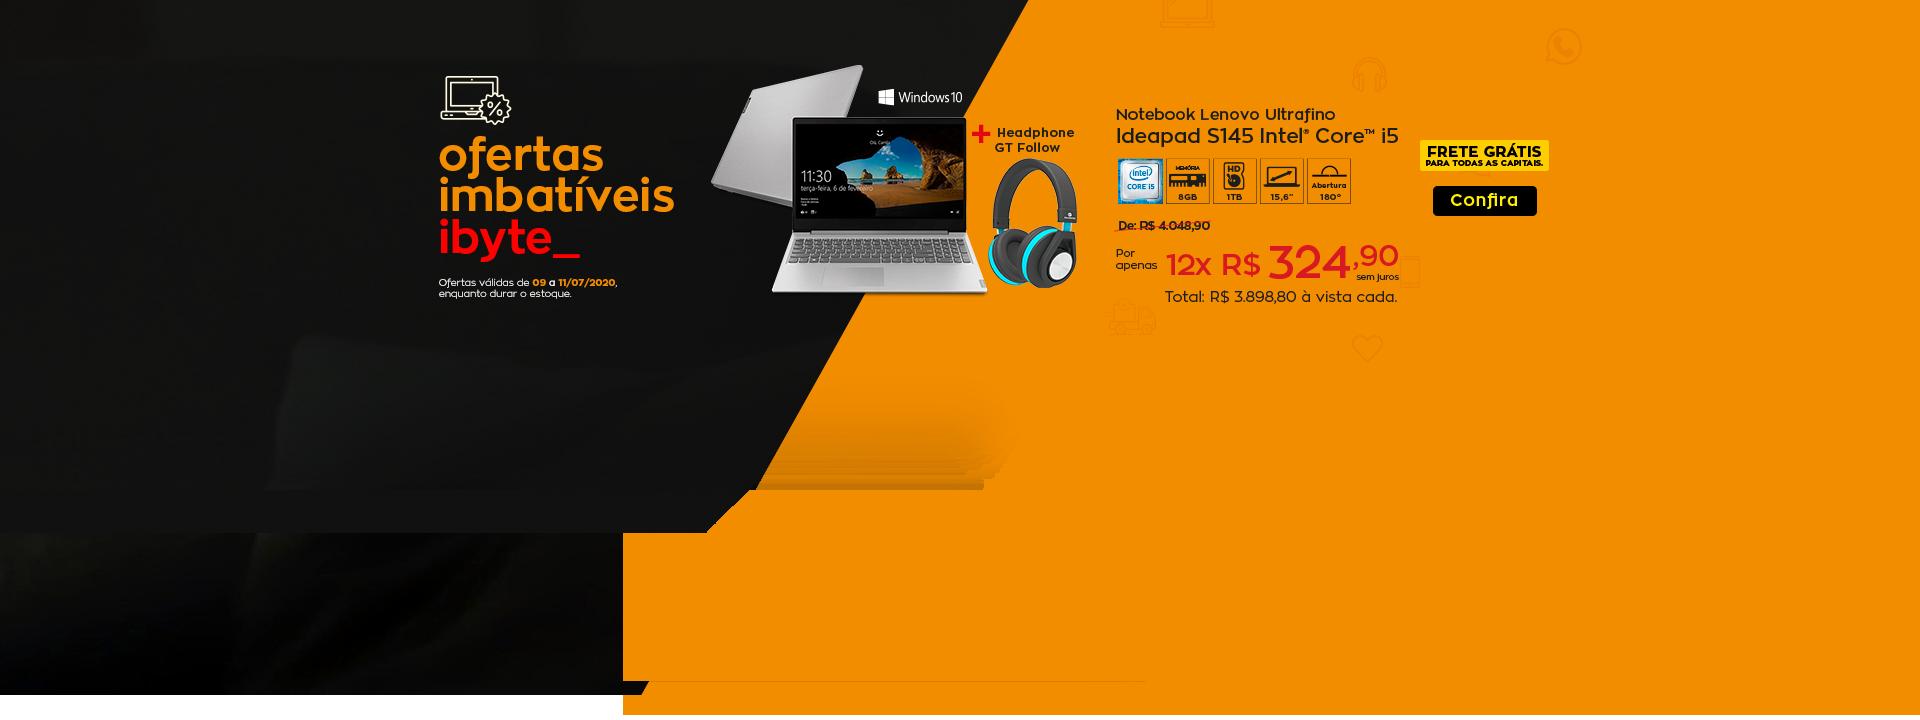 Oferta imbatível - kit notebook Lenovo